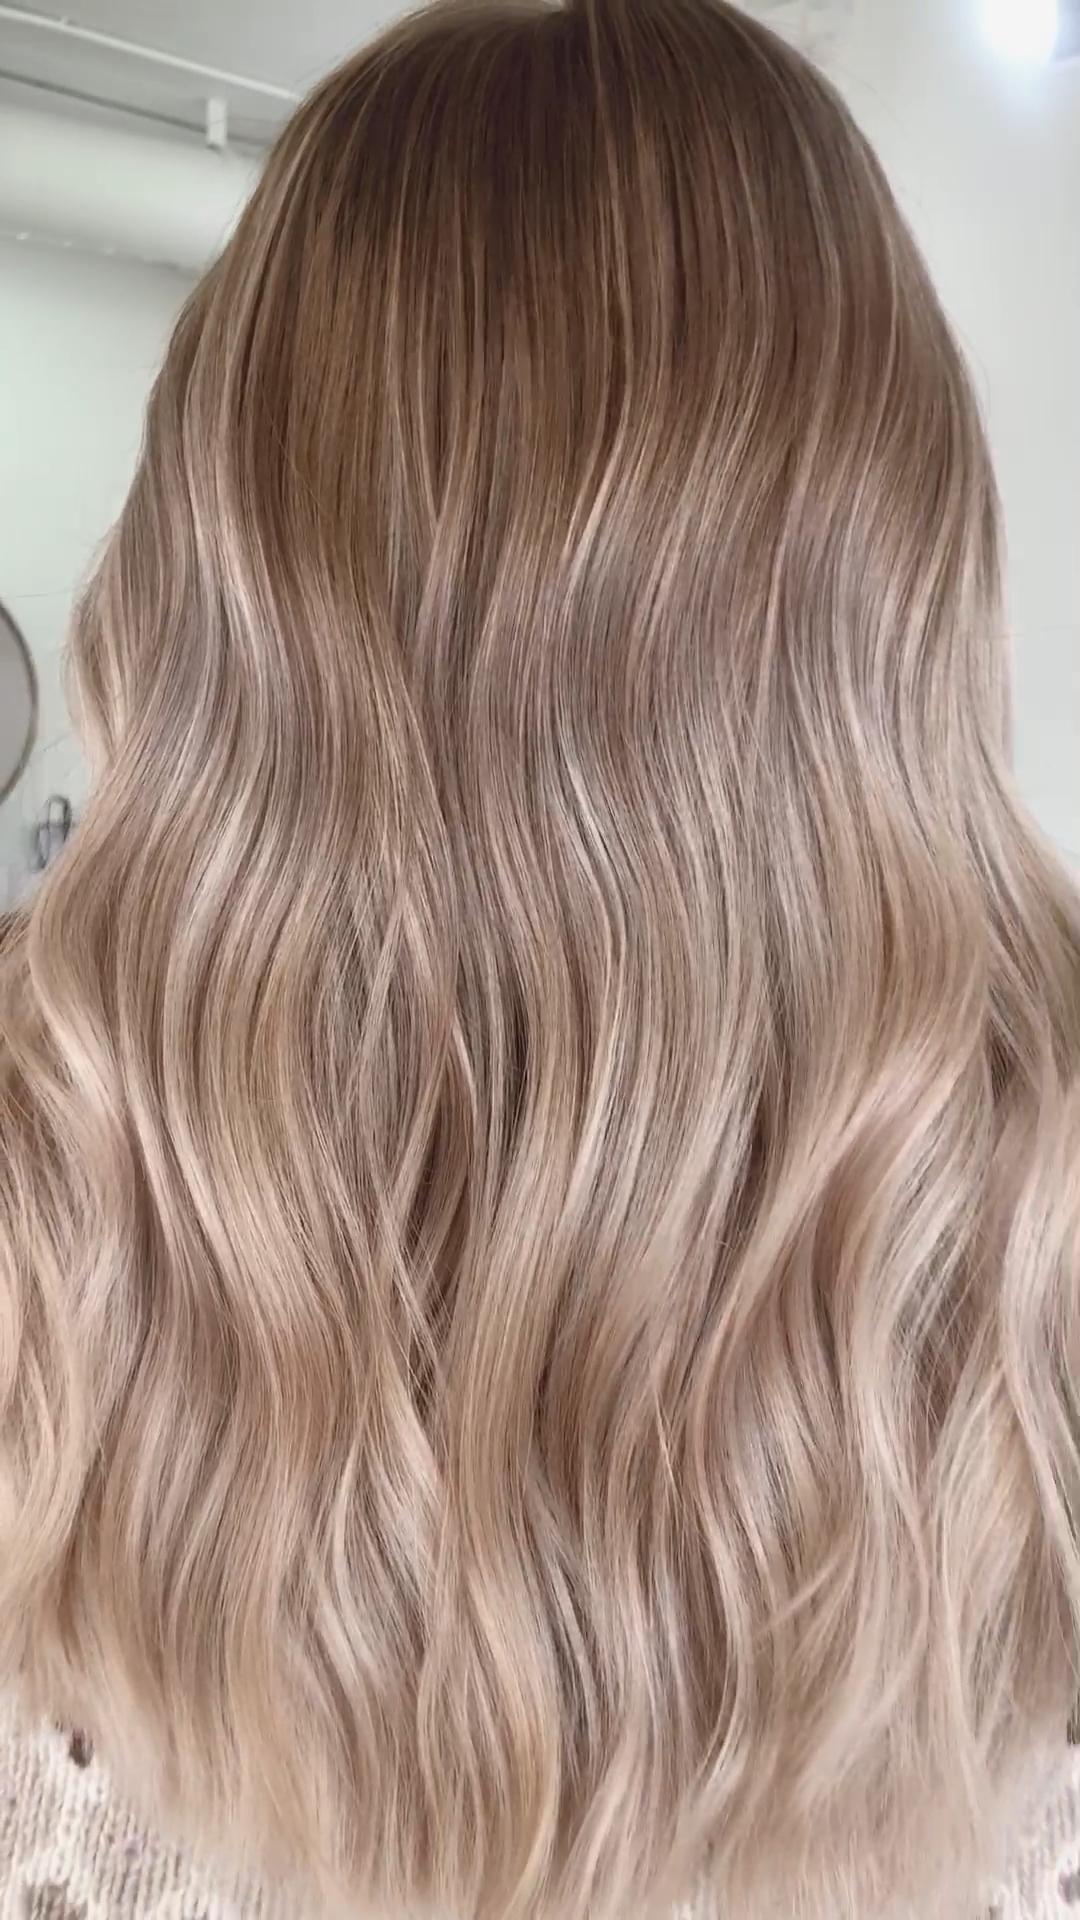 Photo of creamy blonde